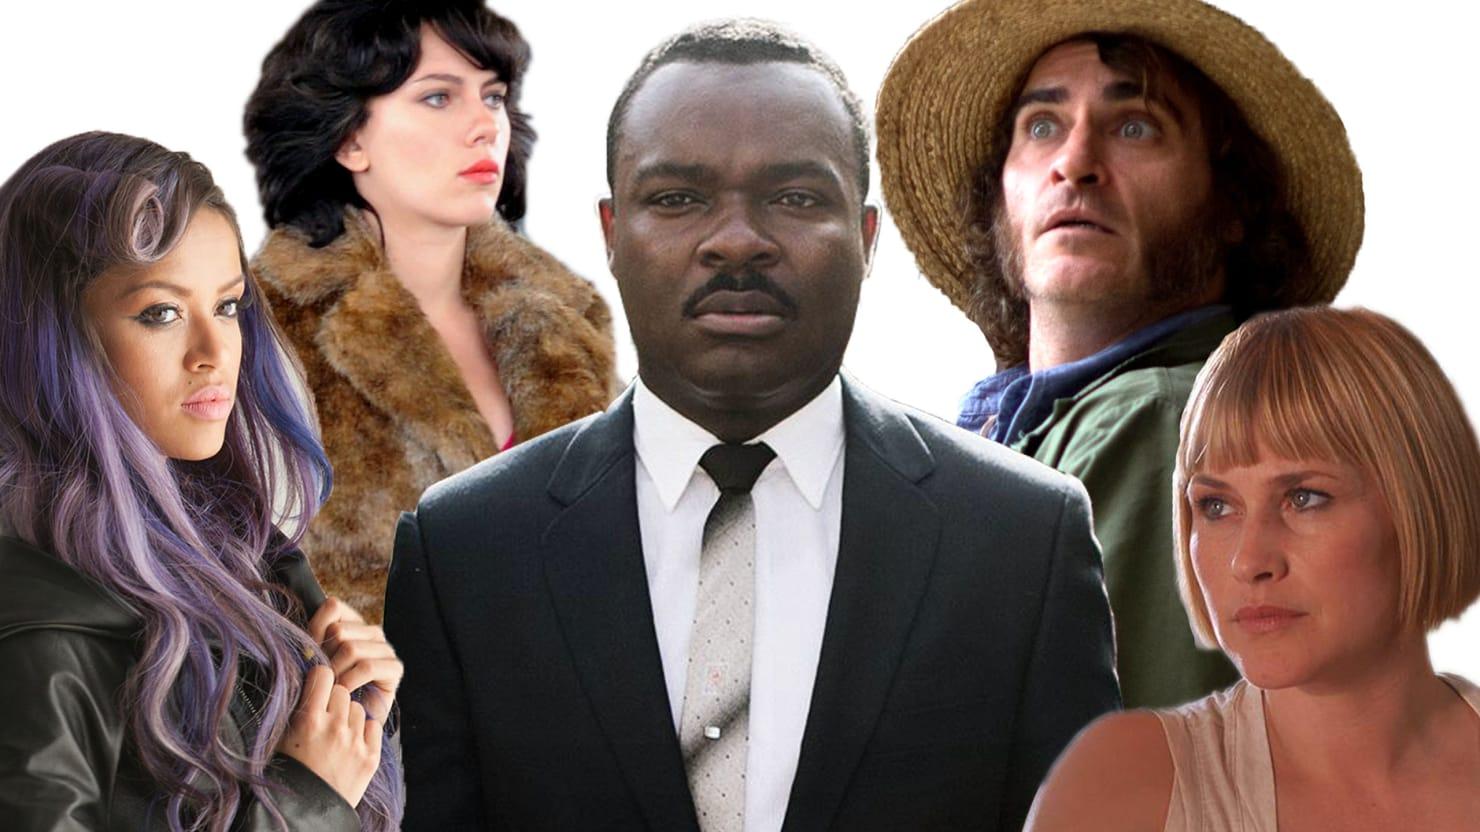 Oscars 2015: The Daily Beast's Picks, From Scarlett Johansson to 'Boyhood'